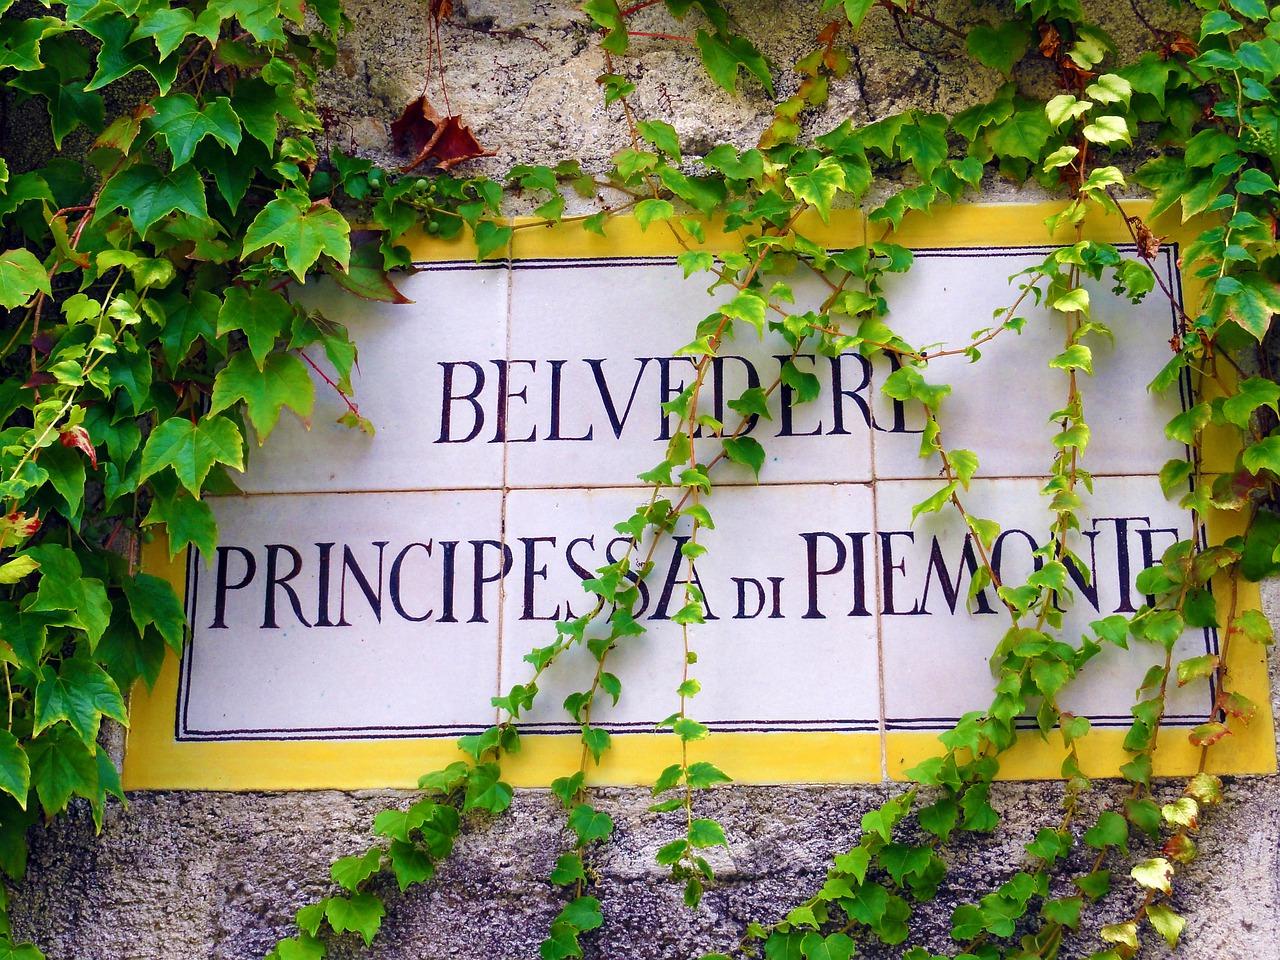 Belvedere Principessa de Piemonte